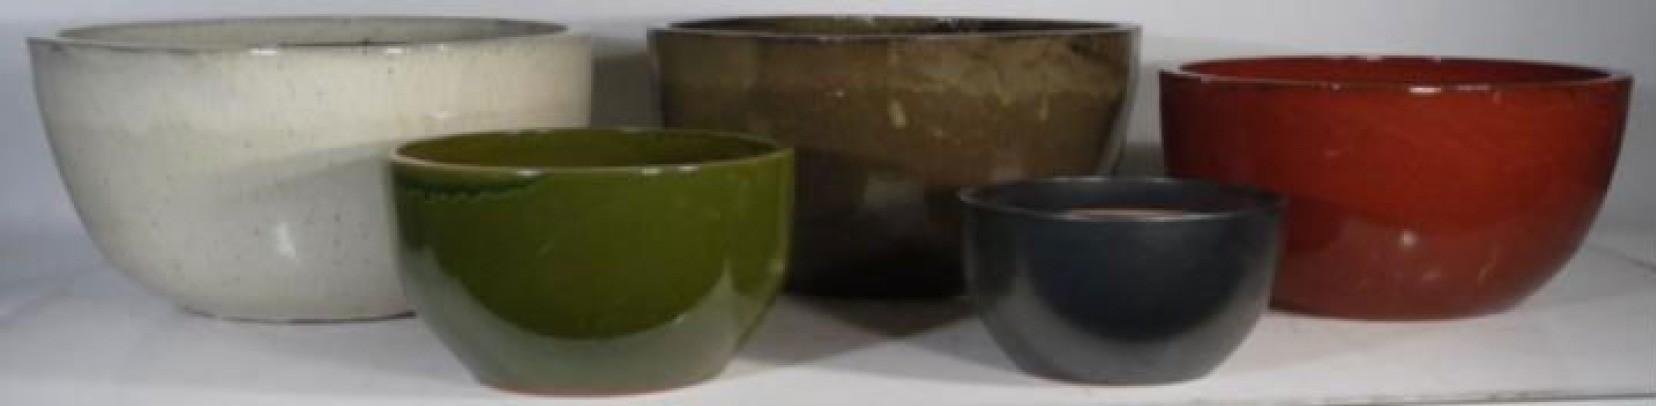 Metallic Black Ht 7'' Ceramic Glazed Planter